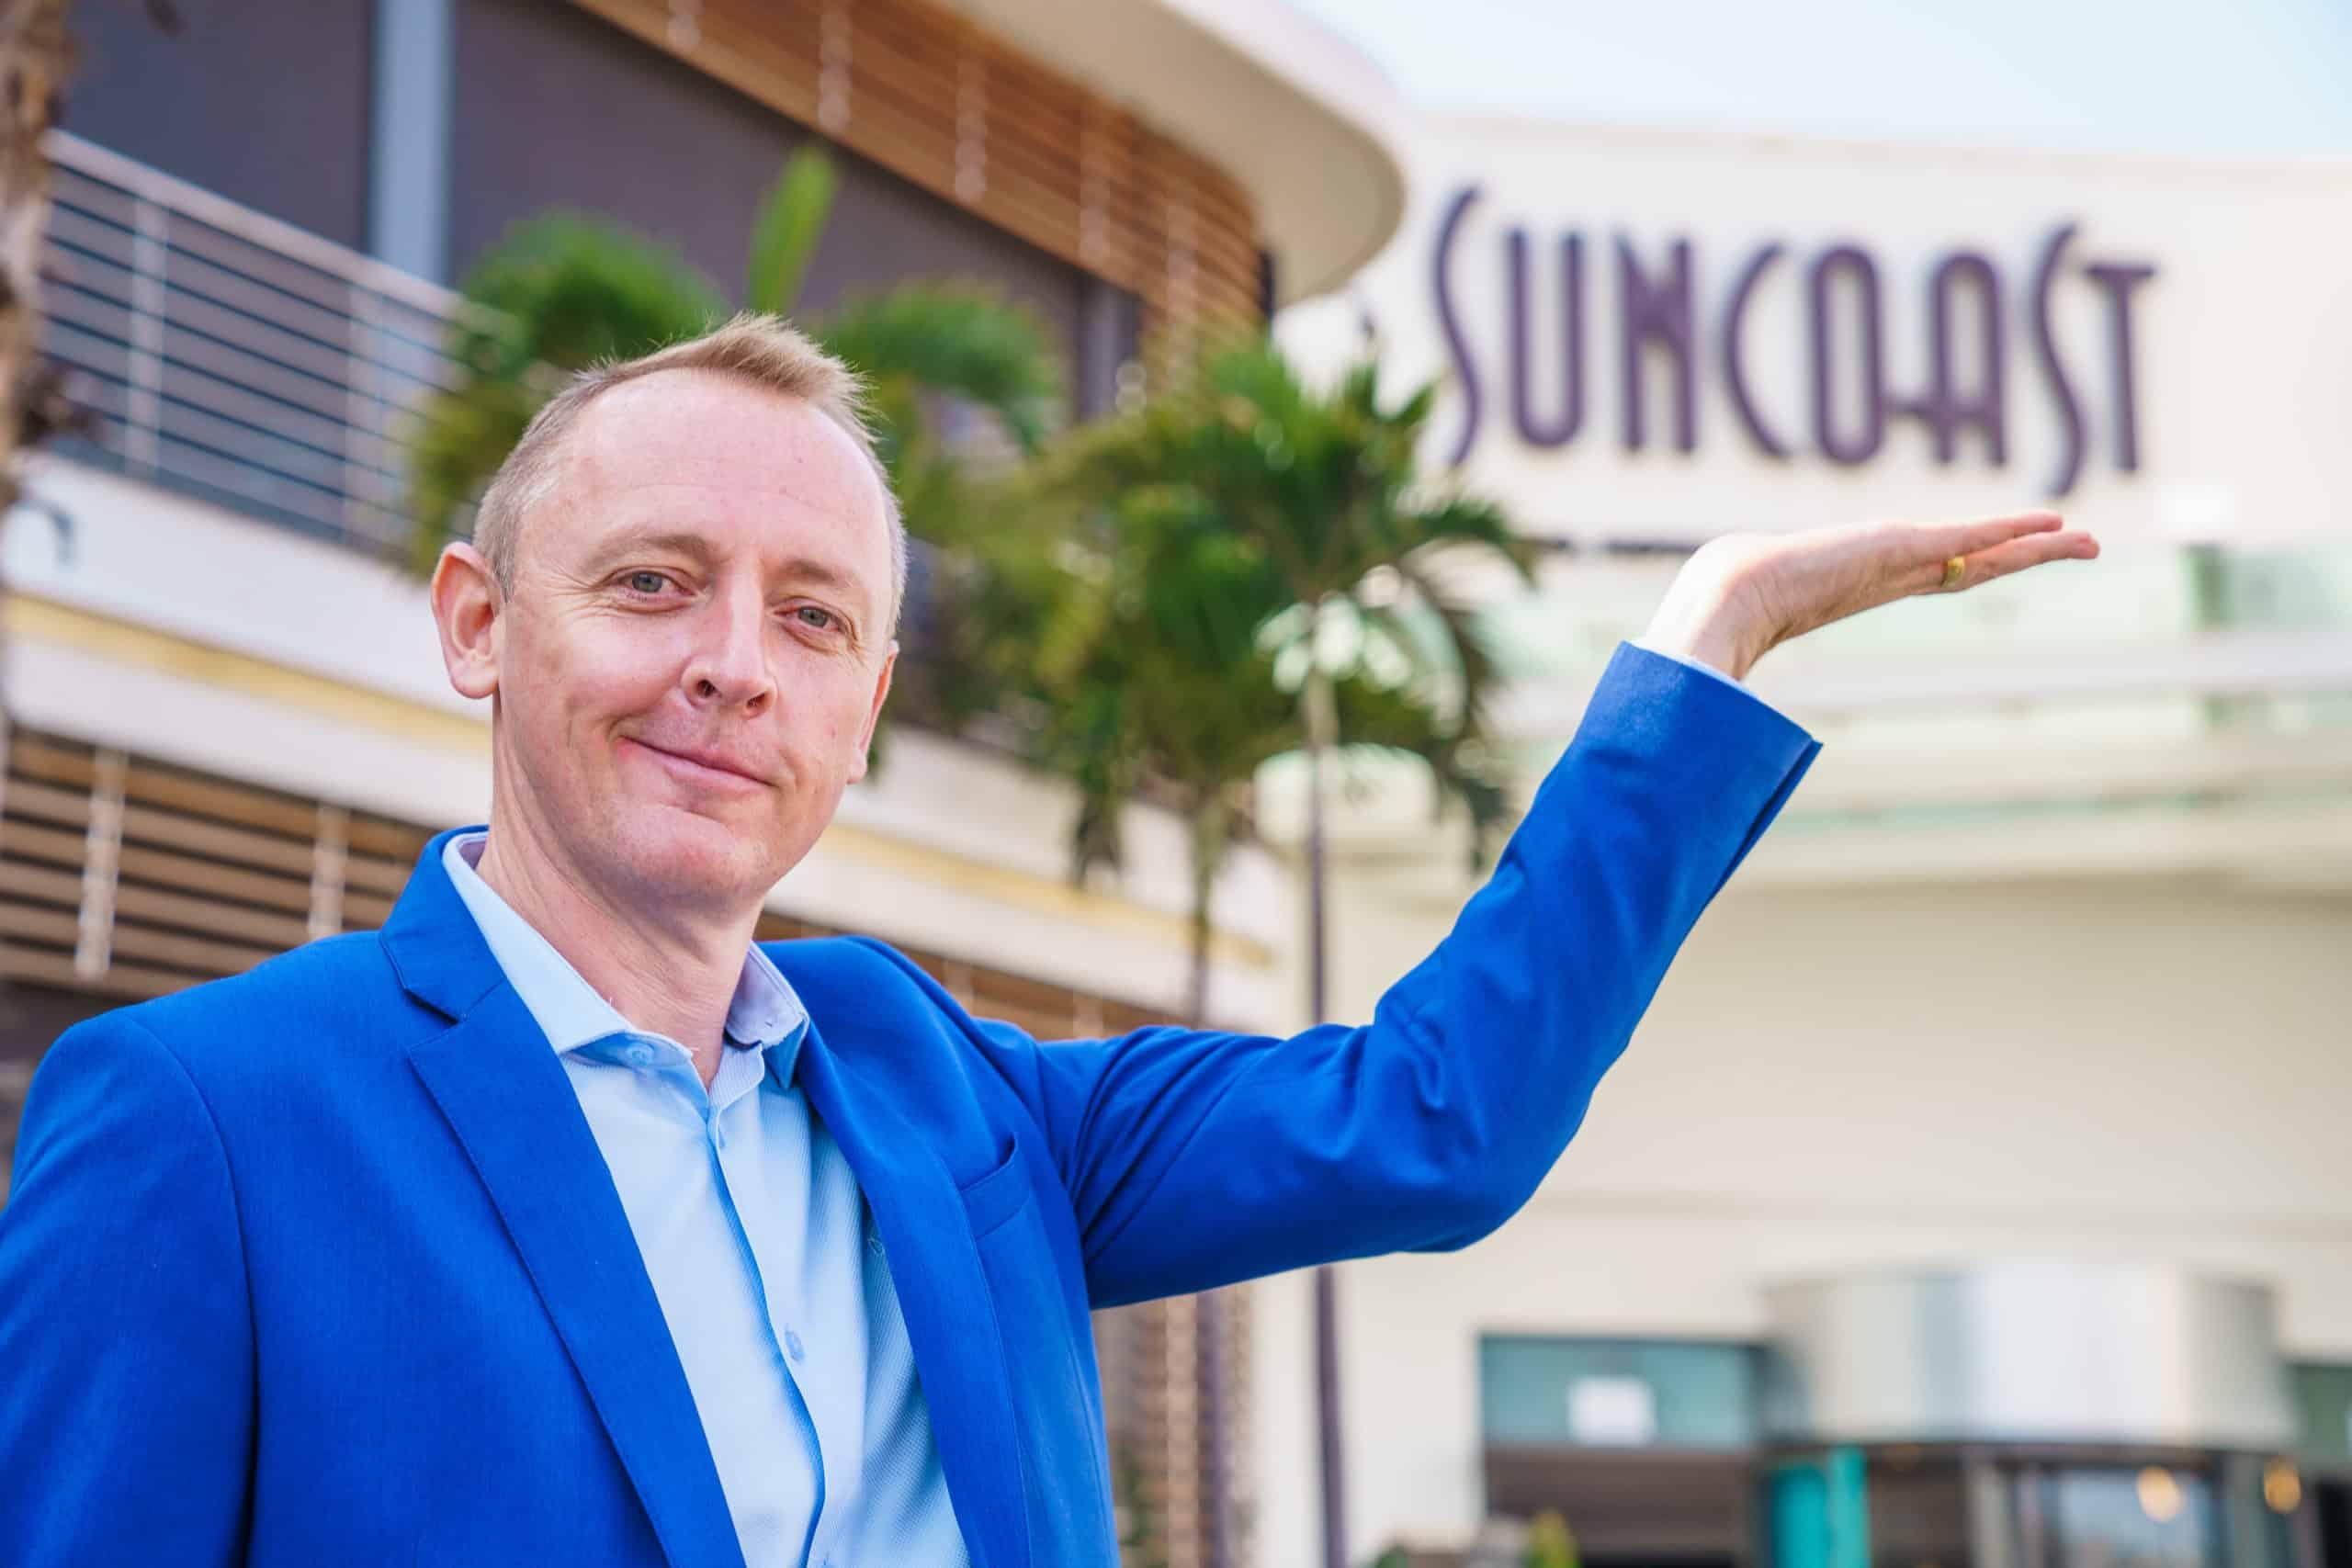 Suncoast Welcomes New Operations Director, Adam Macintyre